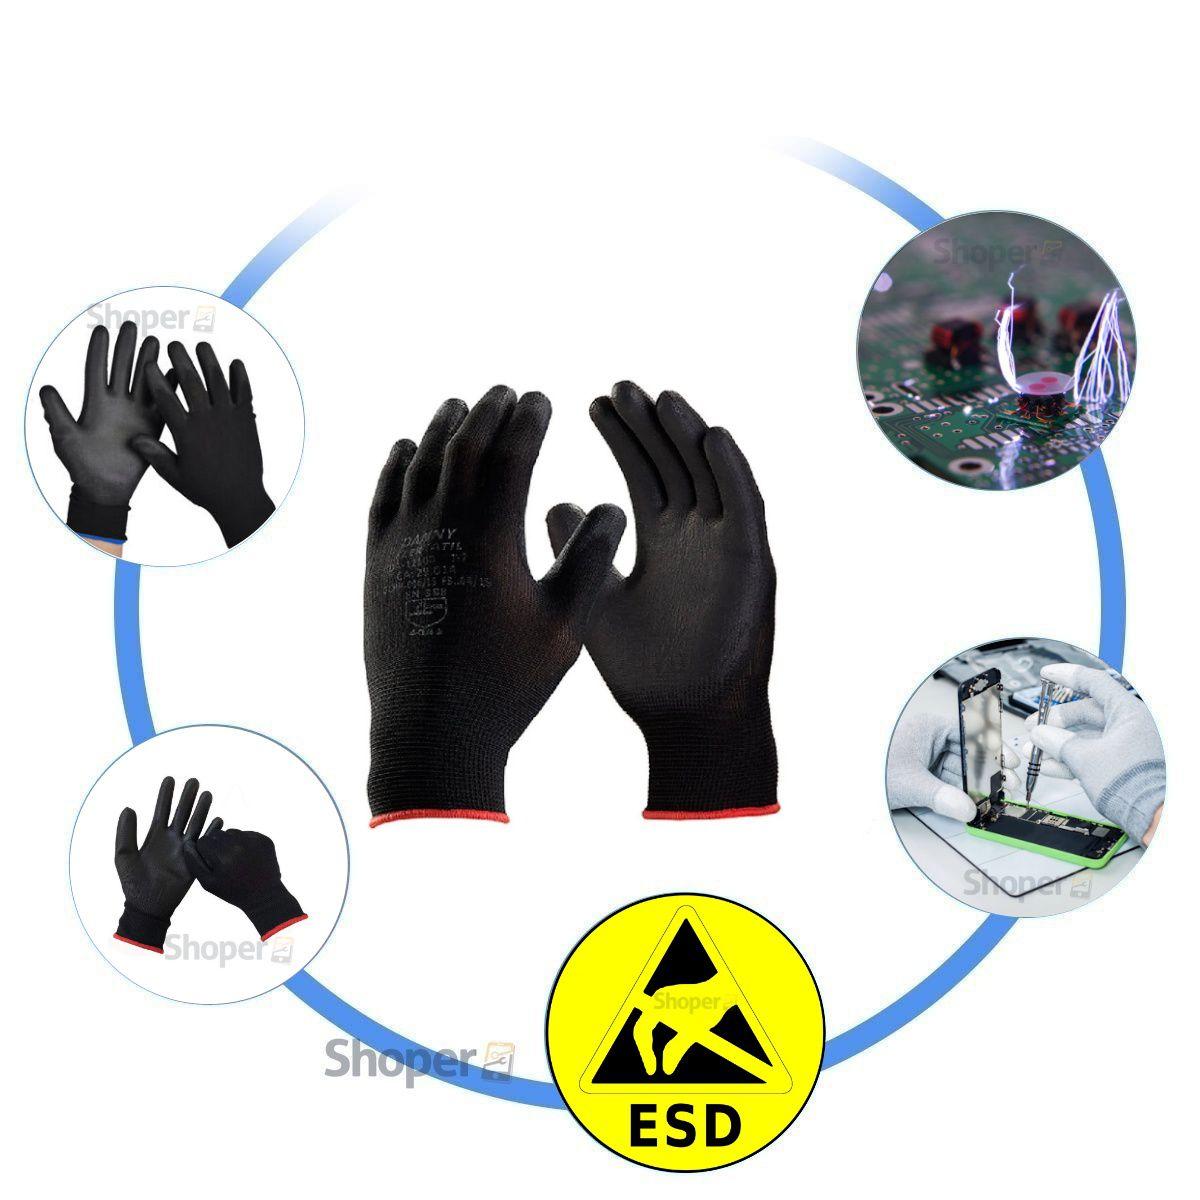 Luva Antiestatica Flextáctil ESD De Nylon P - M - G